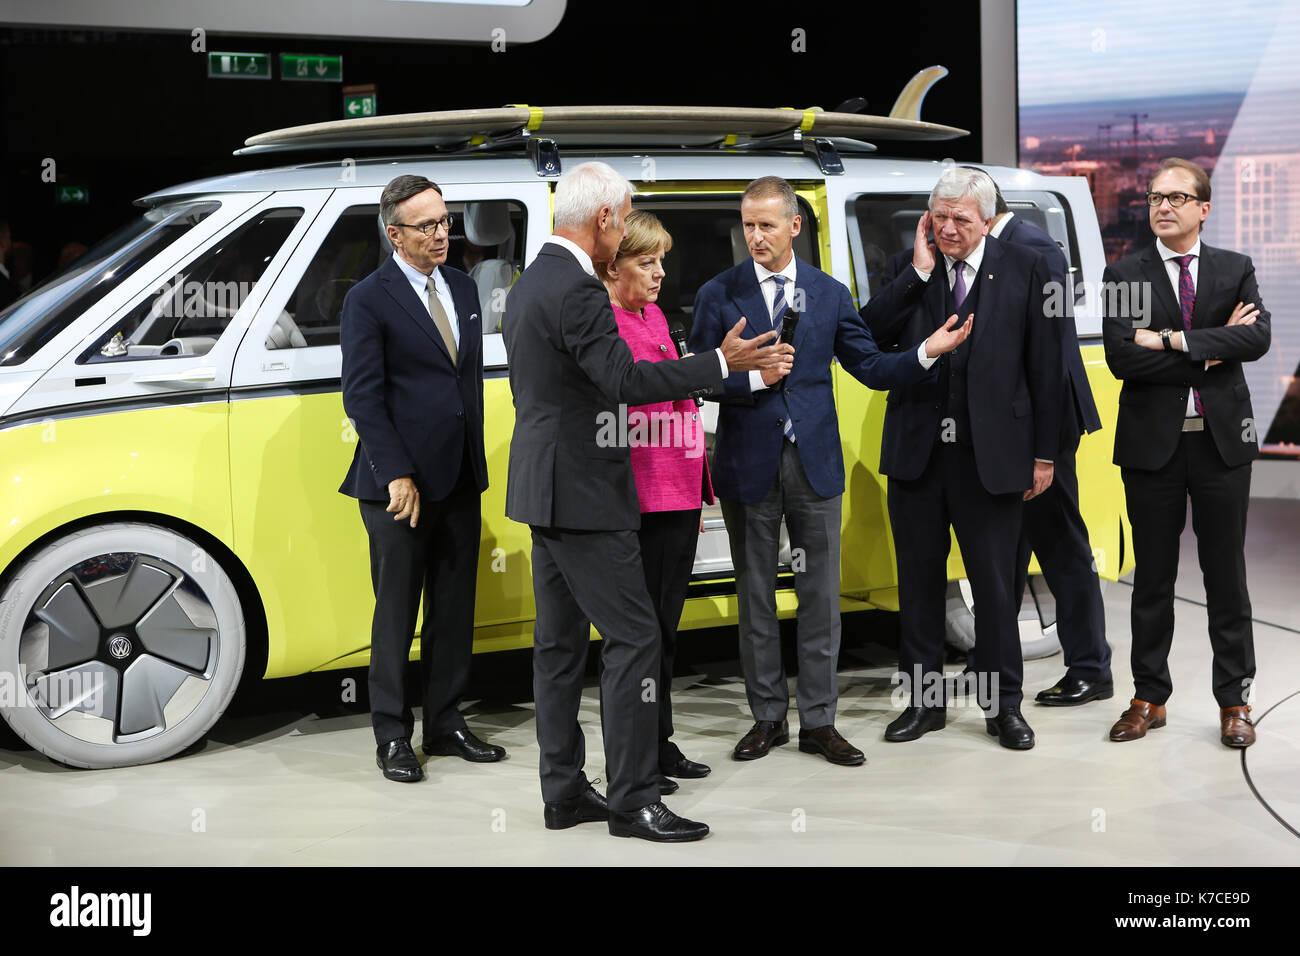 Frankfurt, Germany. 14th September, 2017. International Motor Show 2017 (IAA, Internationale Automobil-Ausstellung), Stock Photo